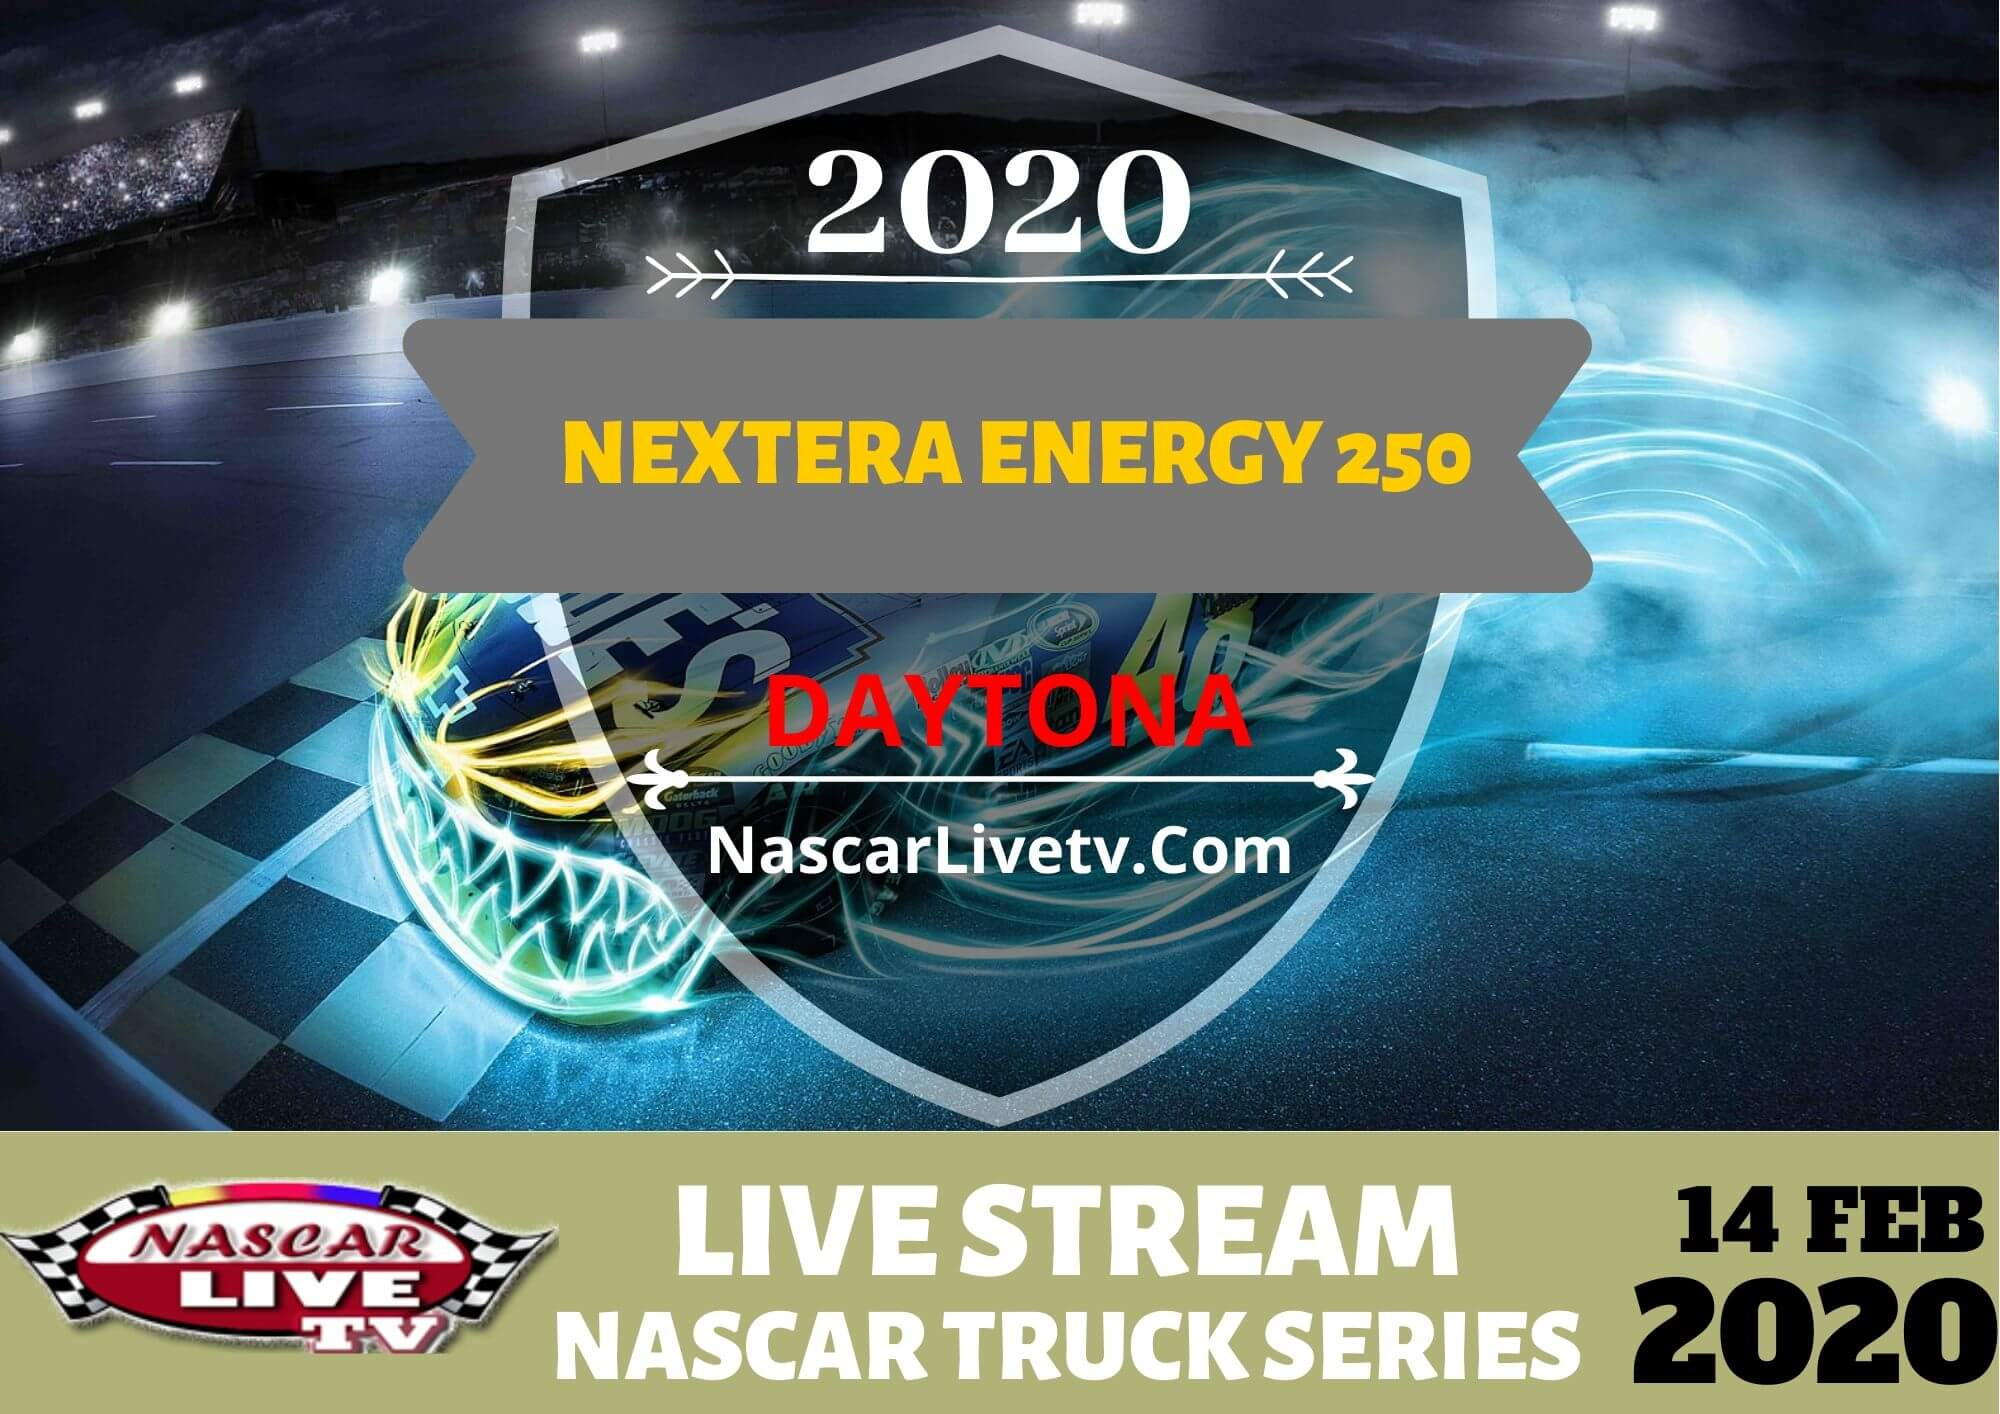 NGOTS NextEra Energy 250 Live Stream 2020